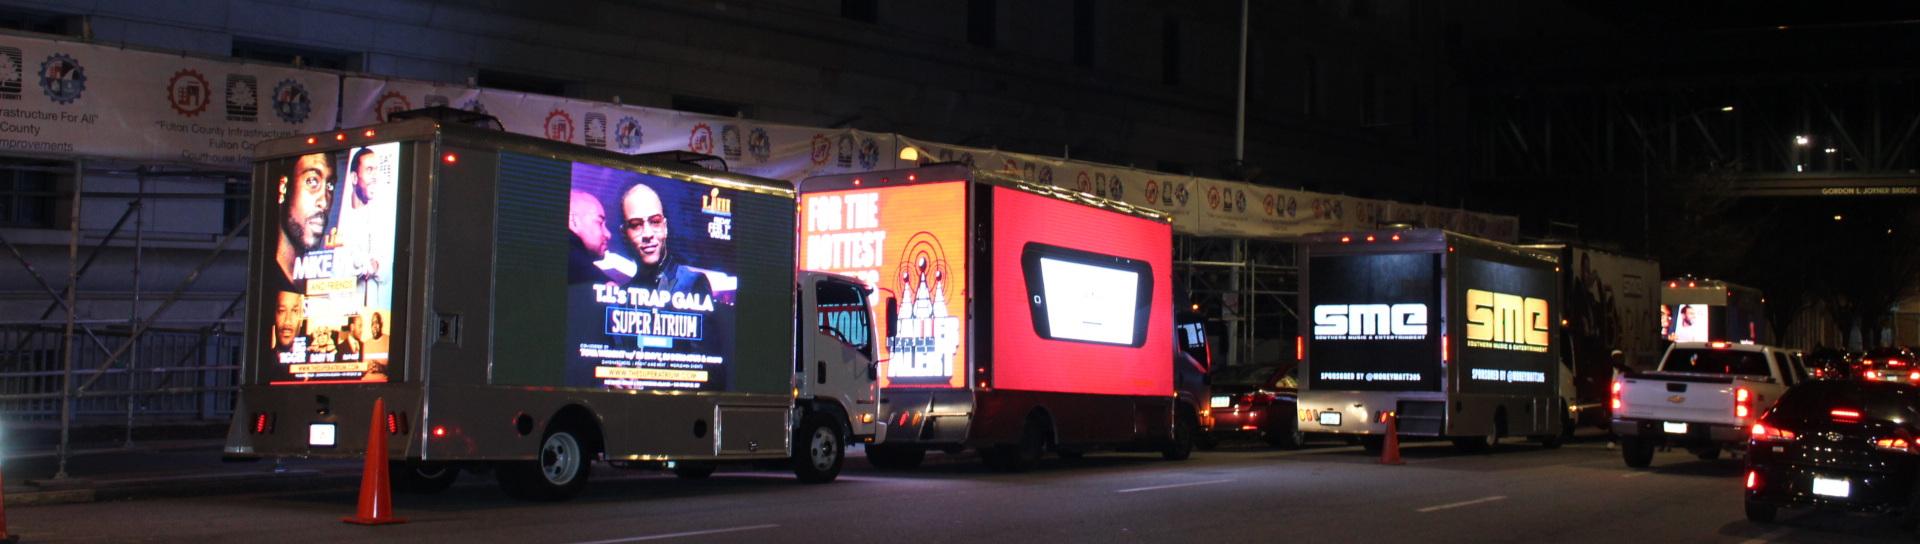 Mobile Billboard Atlanta